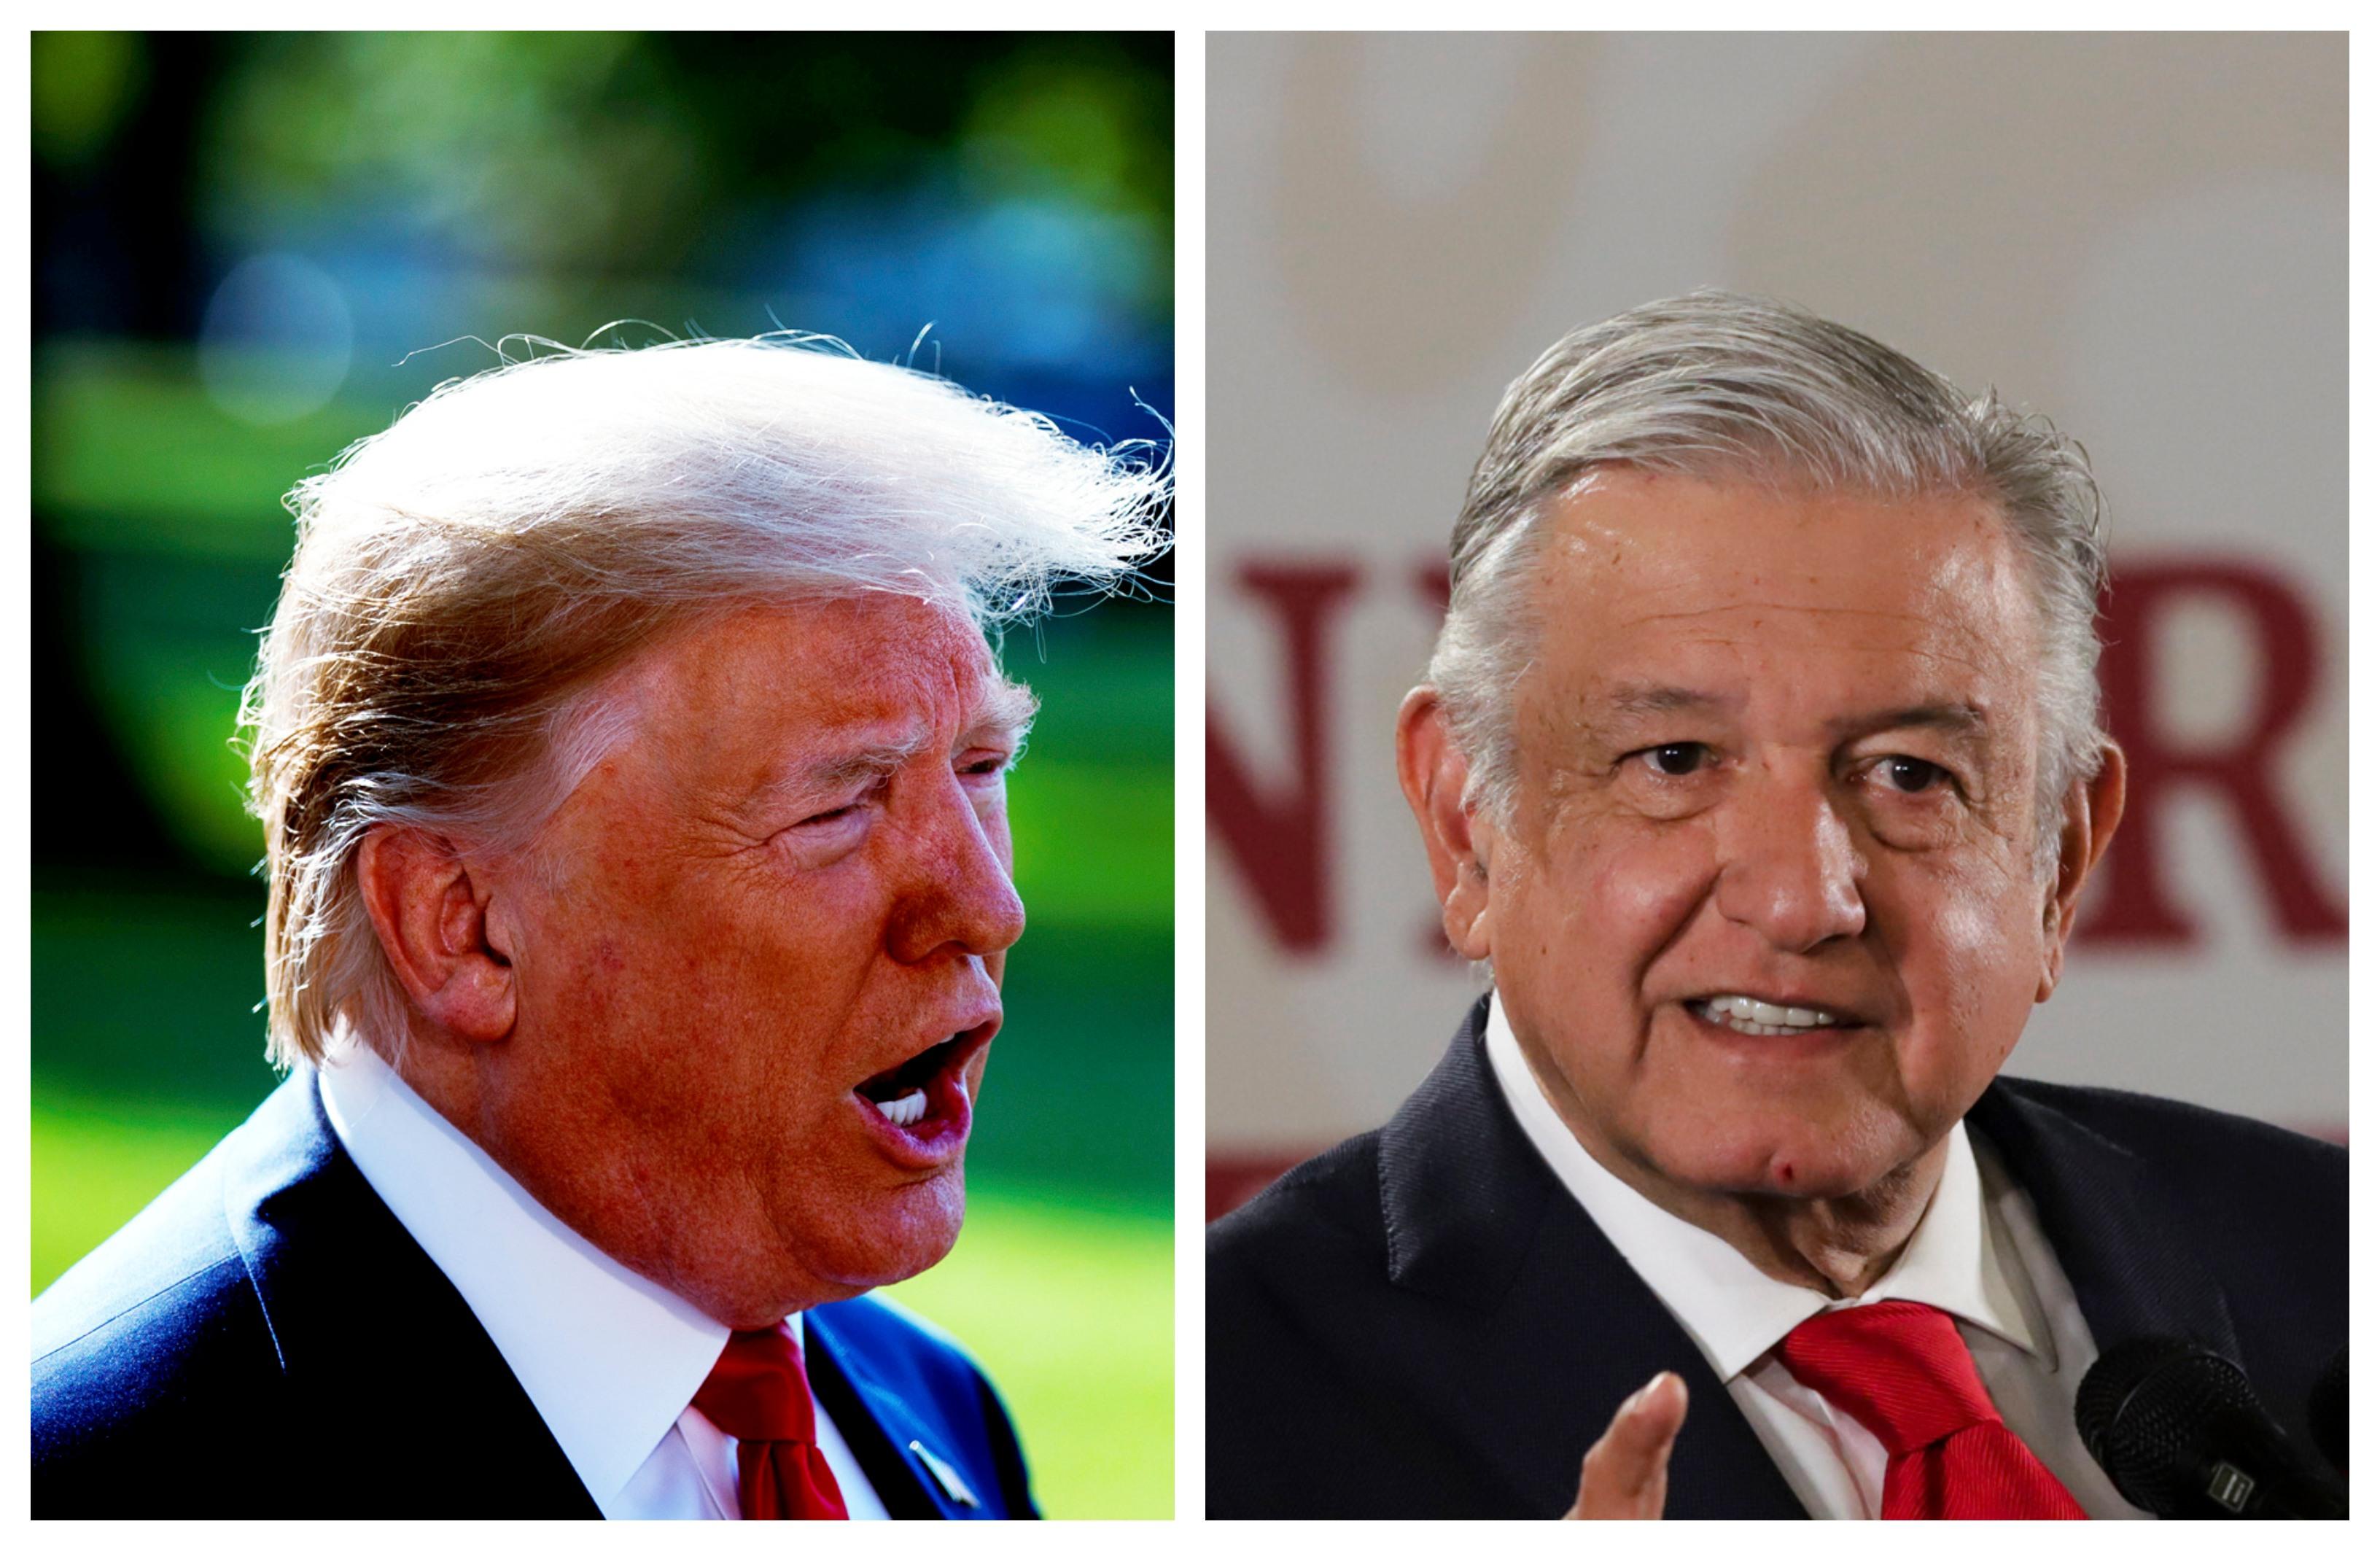 Trump expresa solidaridad a López Obrador por caso Culiacán